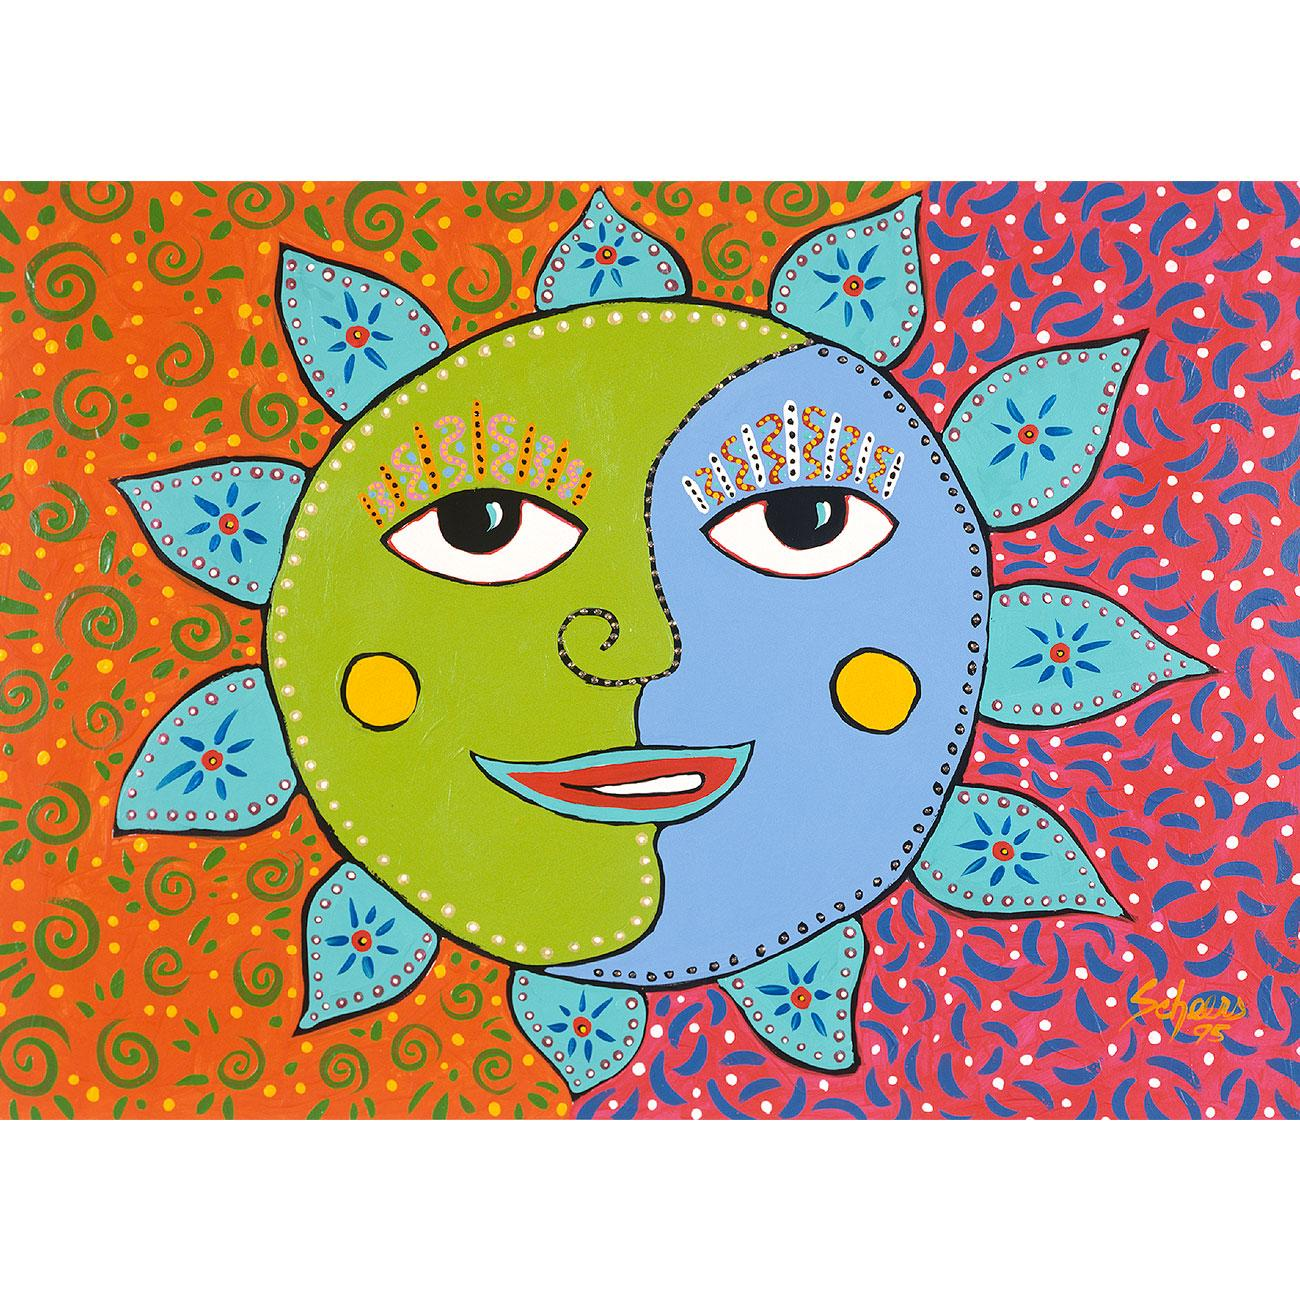 Sunday Morning Sun Greeting Card Artwork By Gwendolyn Scheers